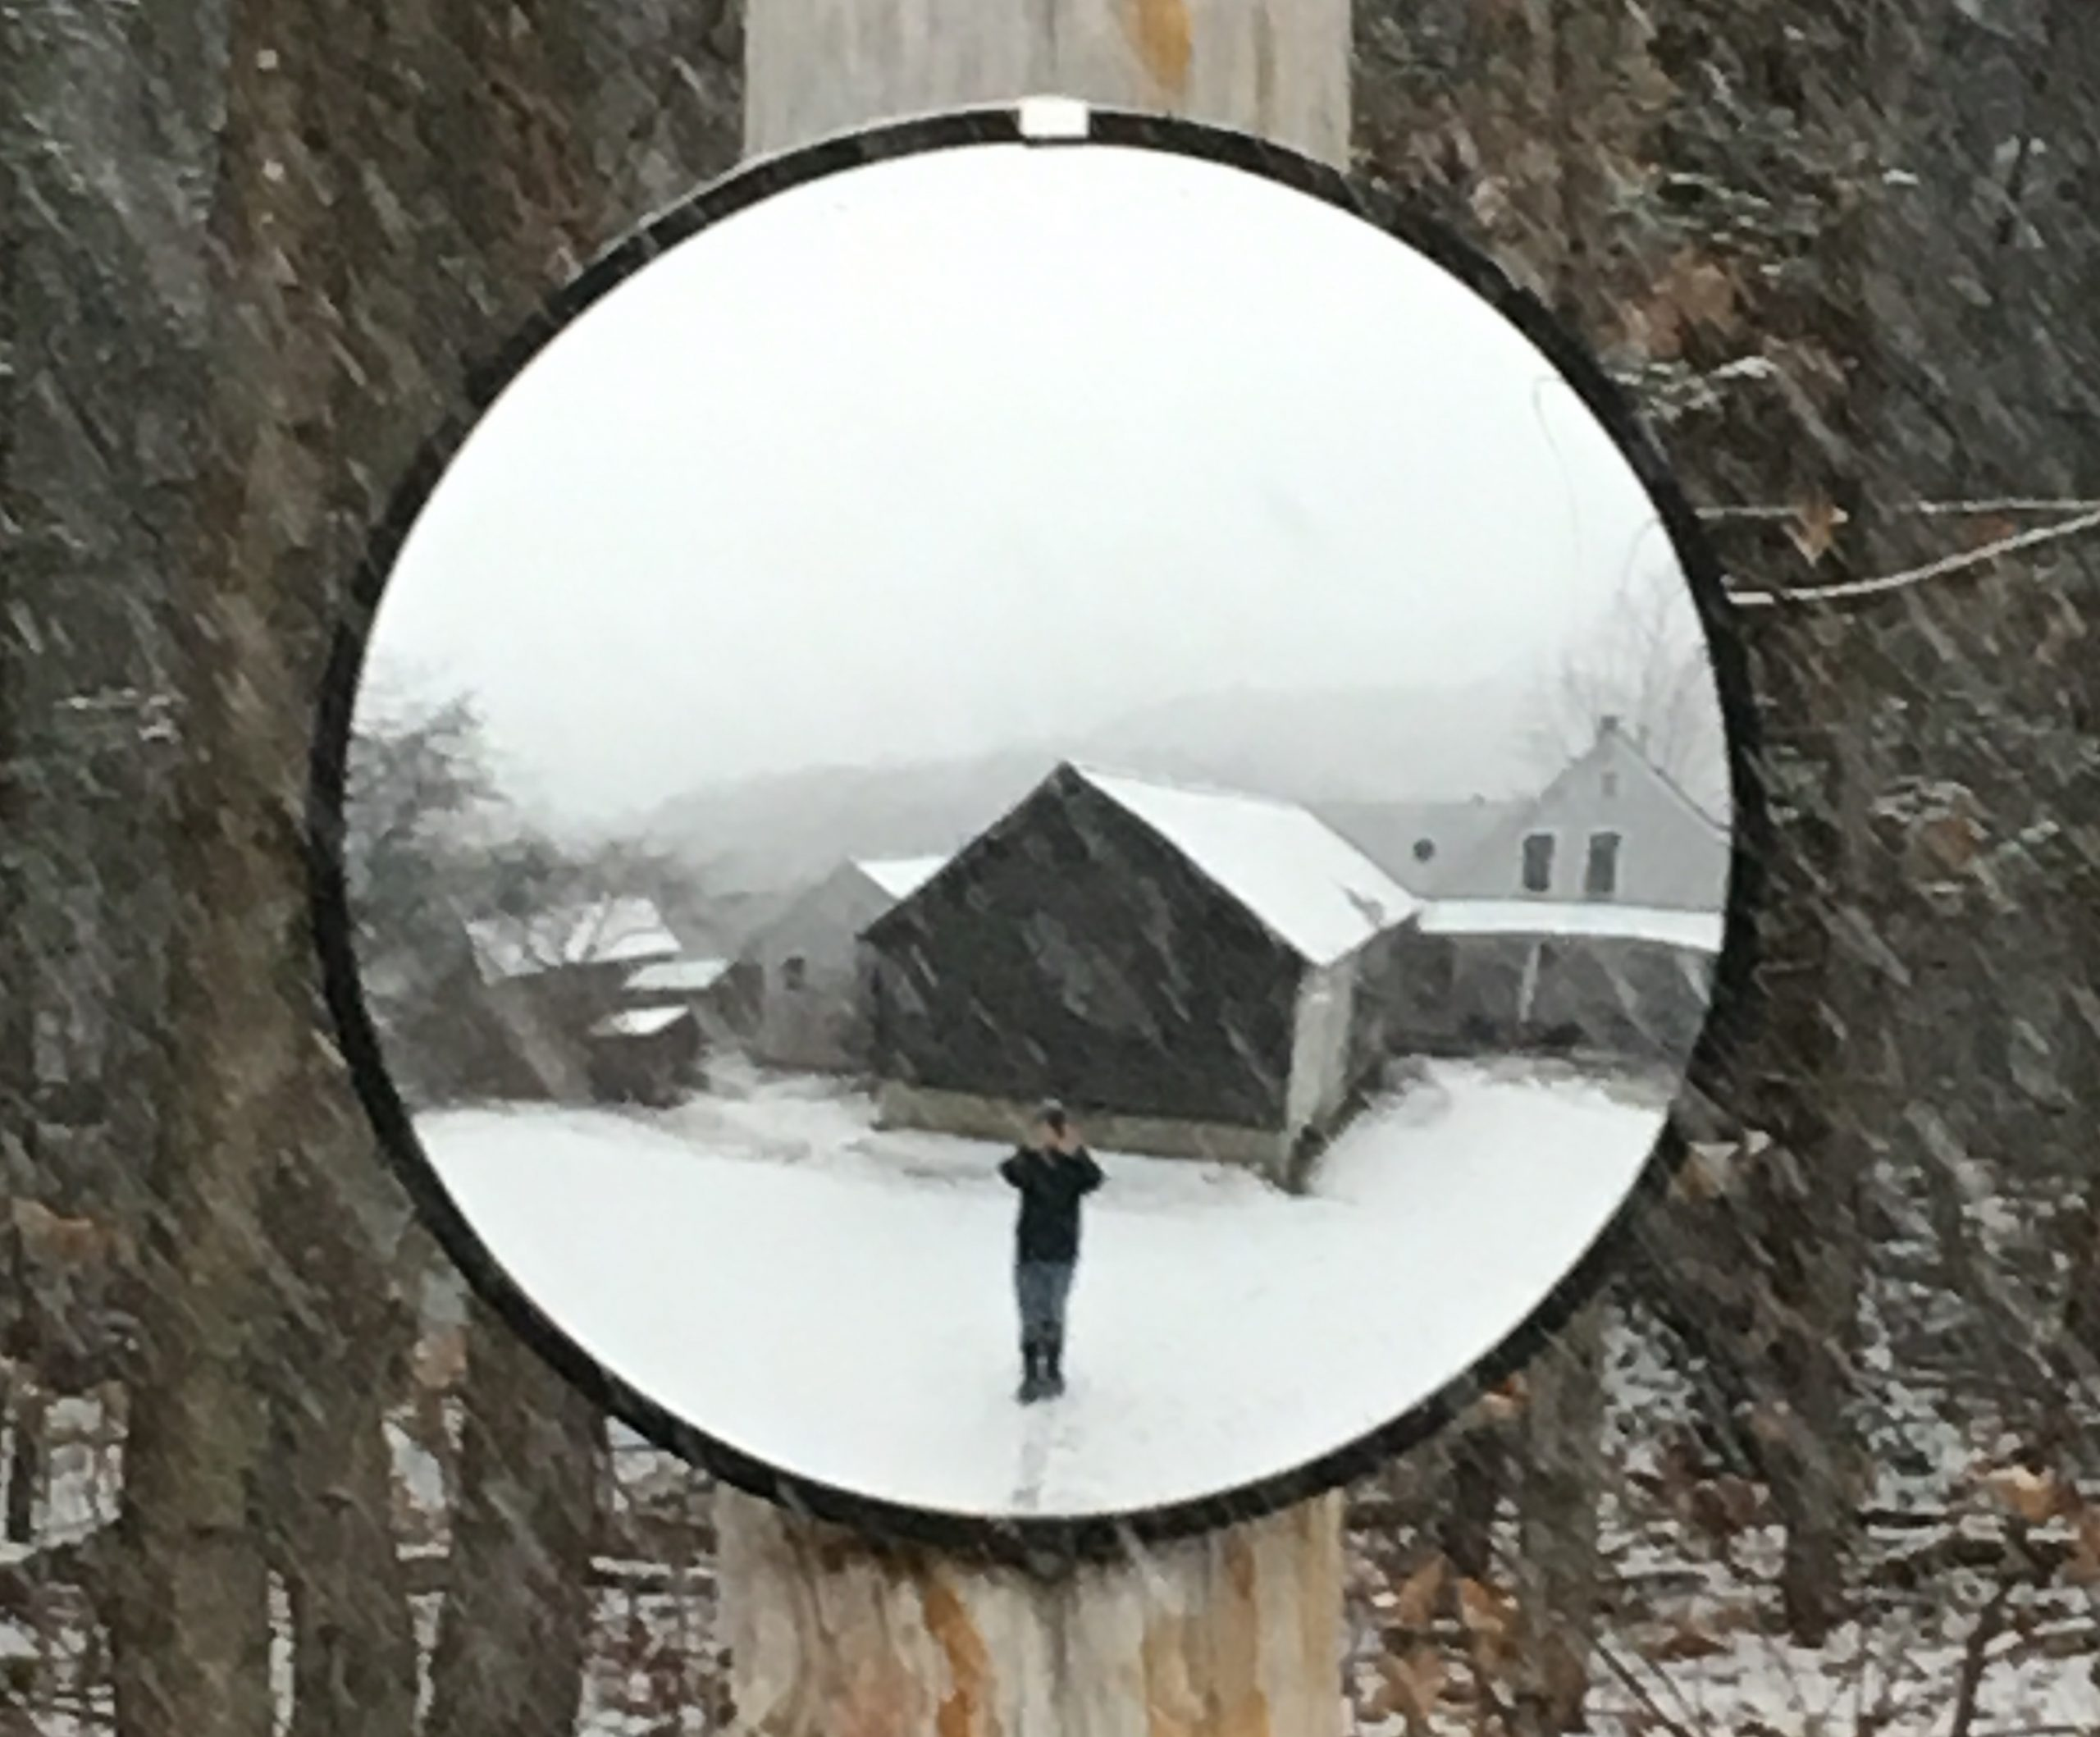 convex mirror reflecting artist taking photo